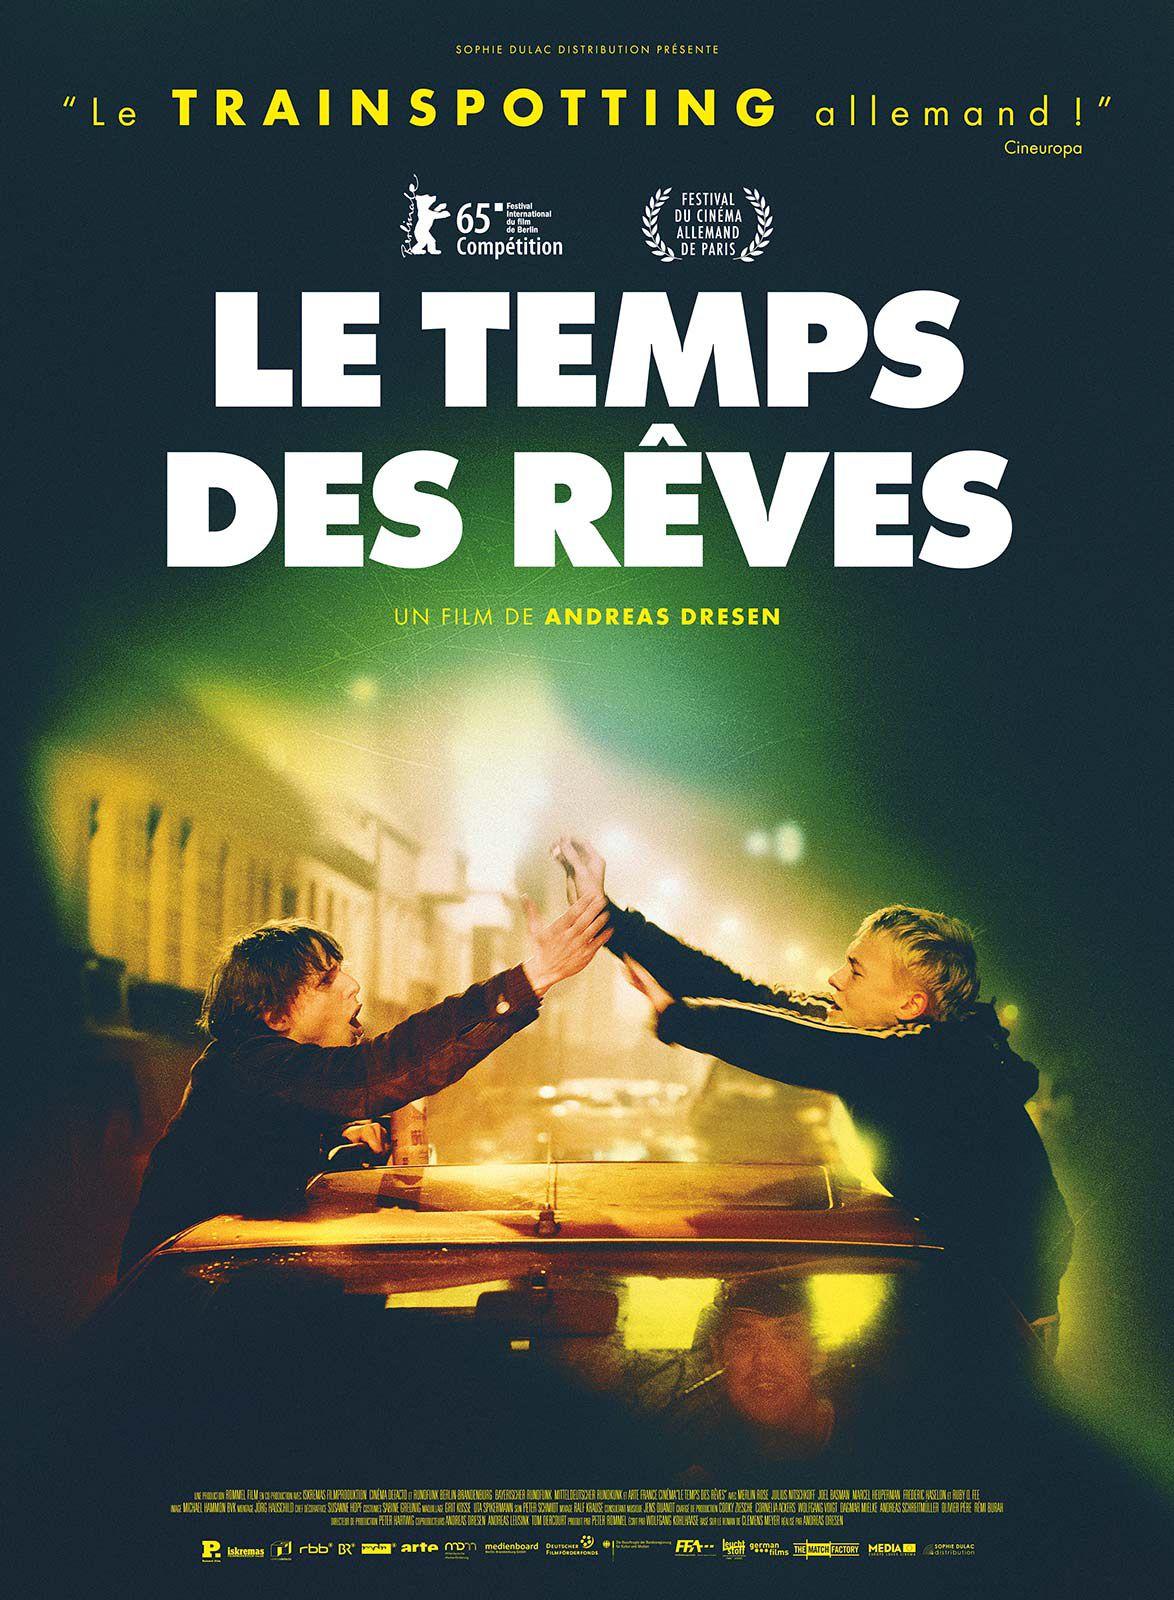 La Vie De Reve Torrent : torrent, Temps, Rêves, (2016), Torrent, Cpasbien